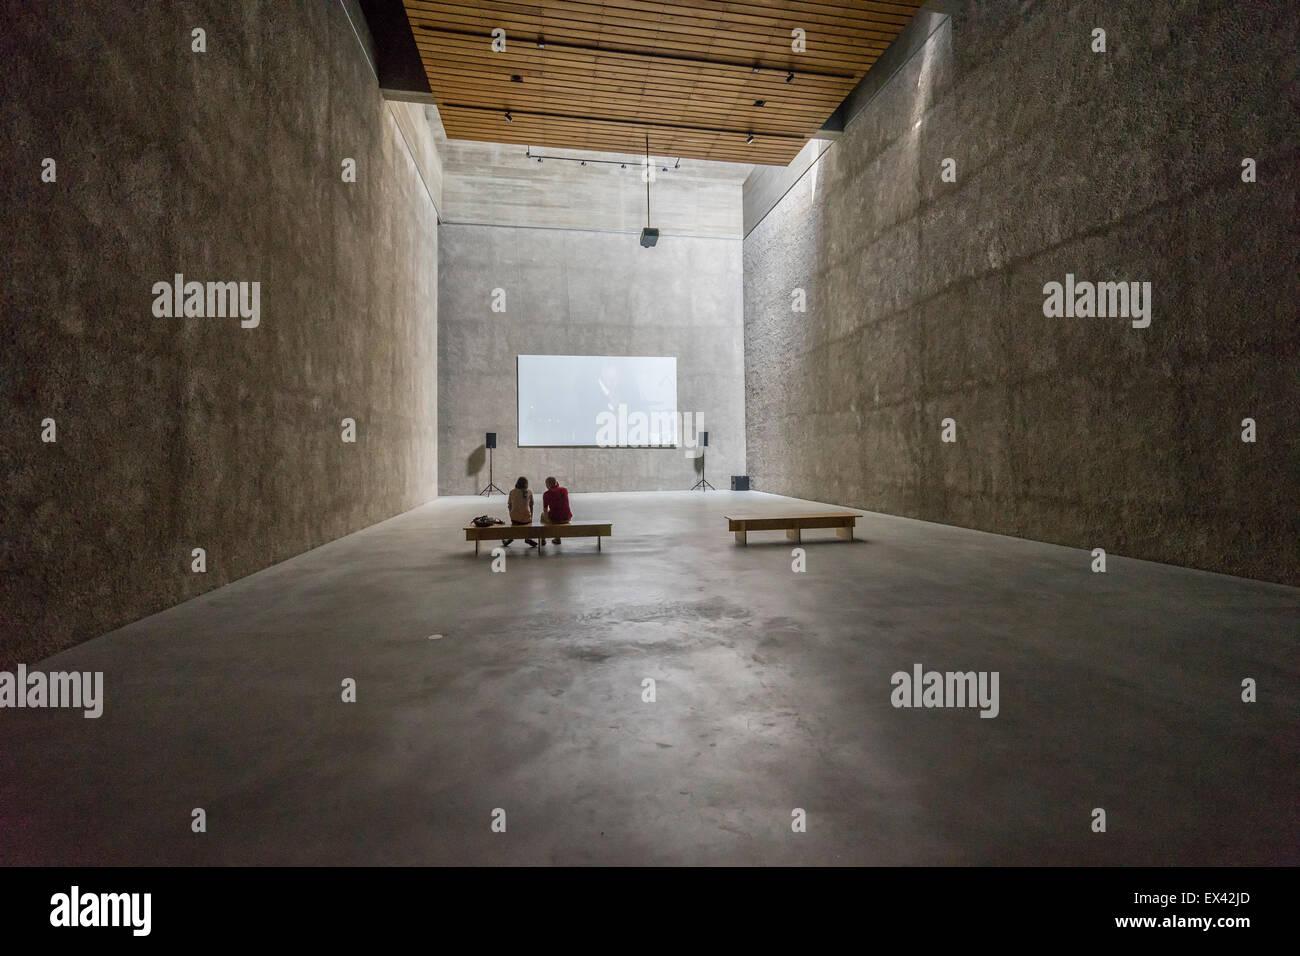 Johann Kšnig gallery inside St Agnes church art space and community centre in Kreuzberg  Berlin Germany - Stock Image